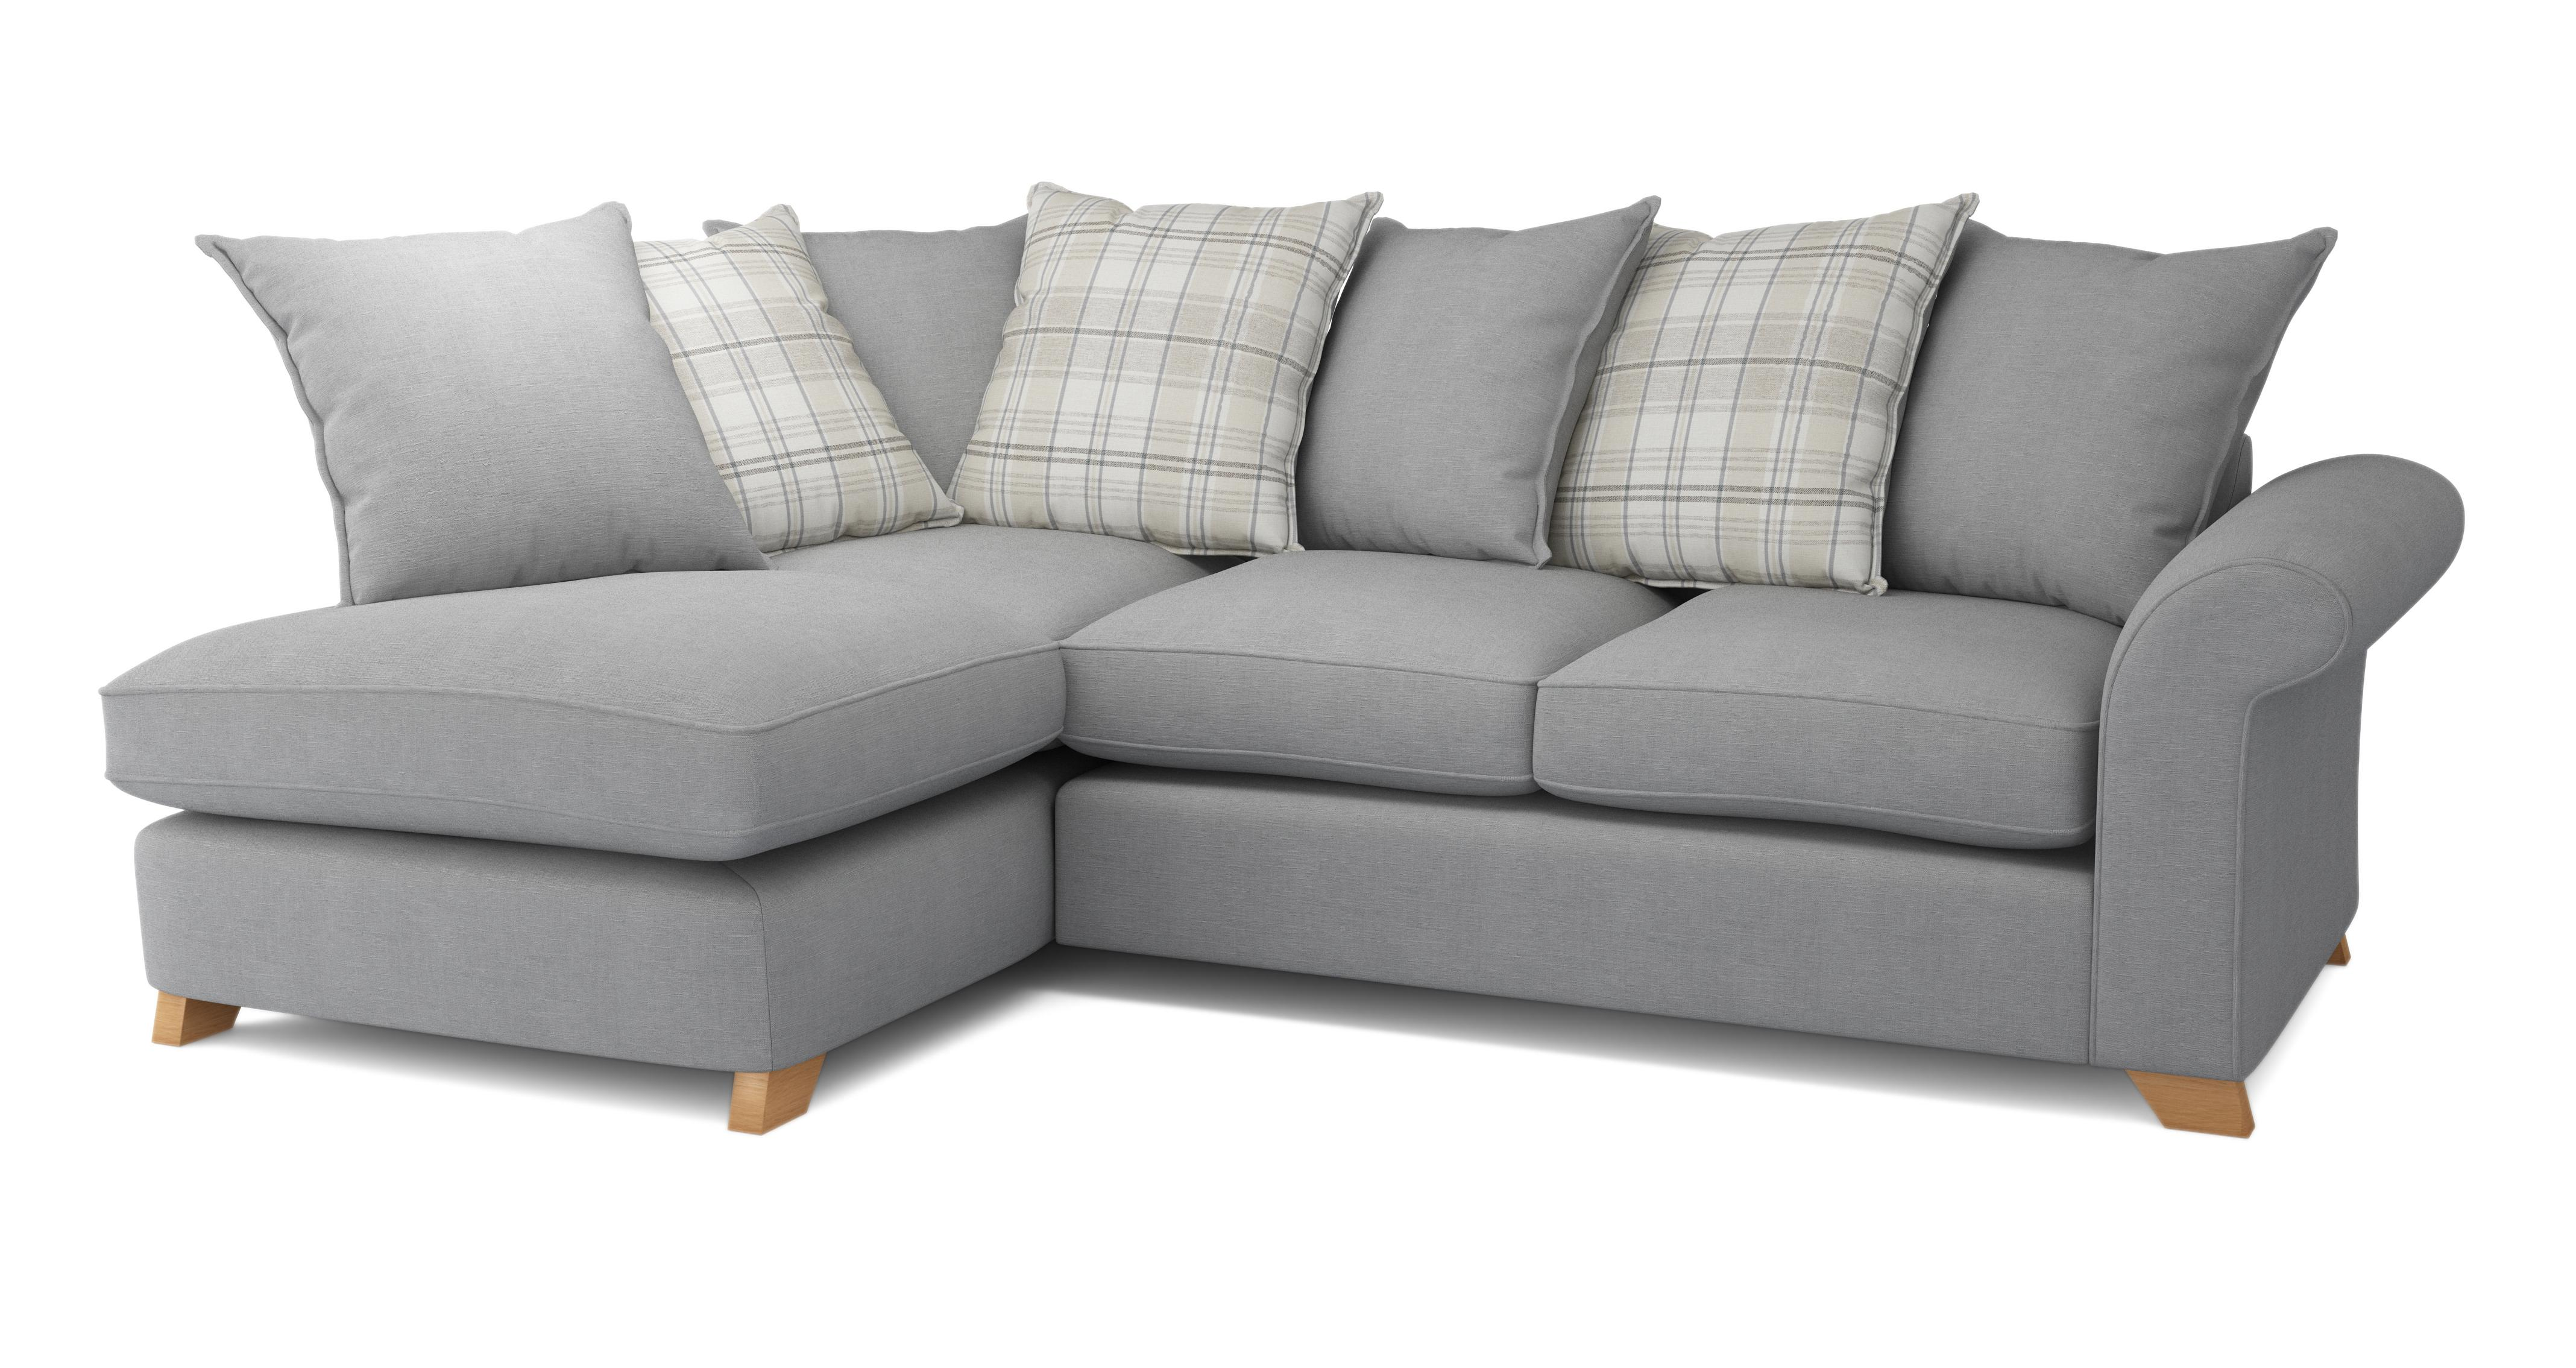 rupert right arm facing pillow back corner sofa dfs - Corner Sofa